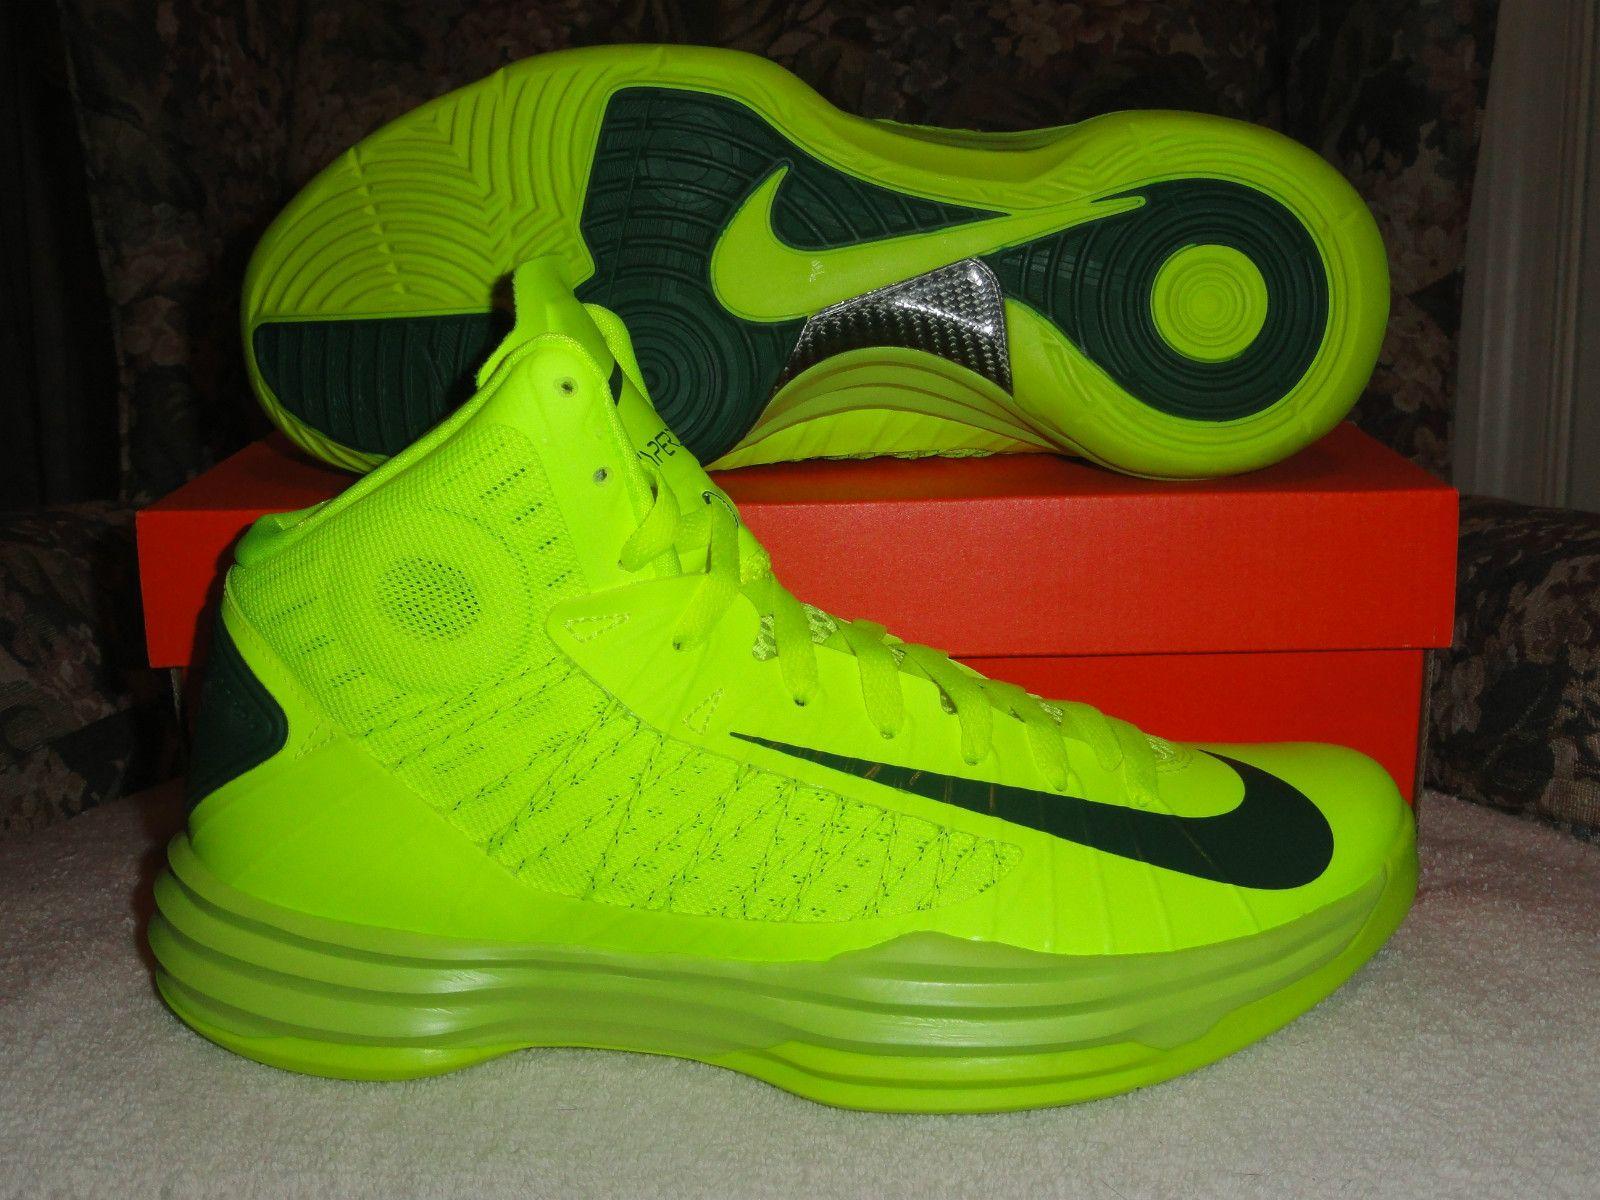 los angeles f434e 4377f Nike Hyperdunk 2012 Volt Gorge Green Dead Stock Basketball Sneakers  Nike   NikeHyperdunk  NikeBasketball